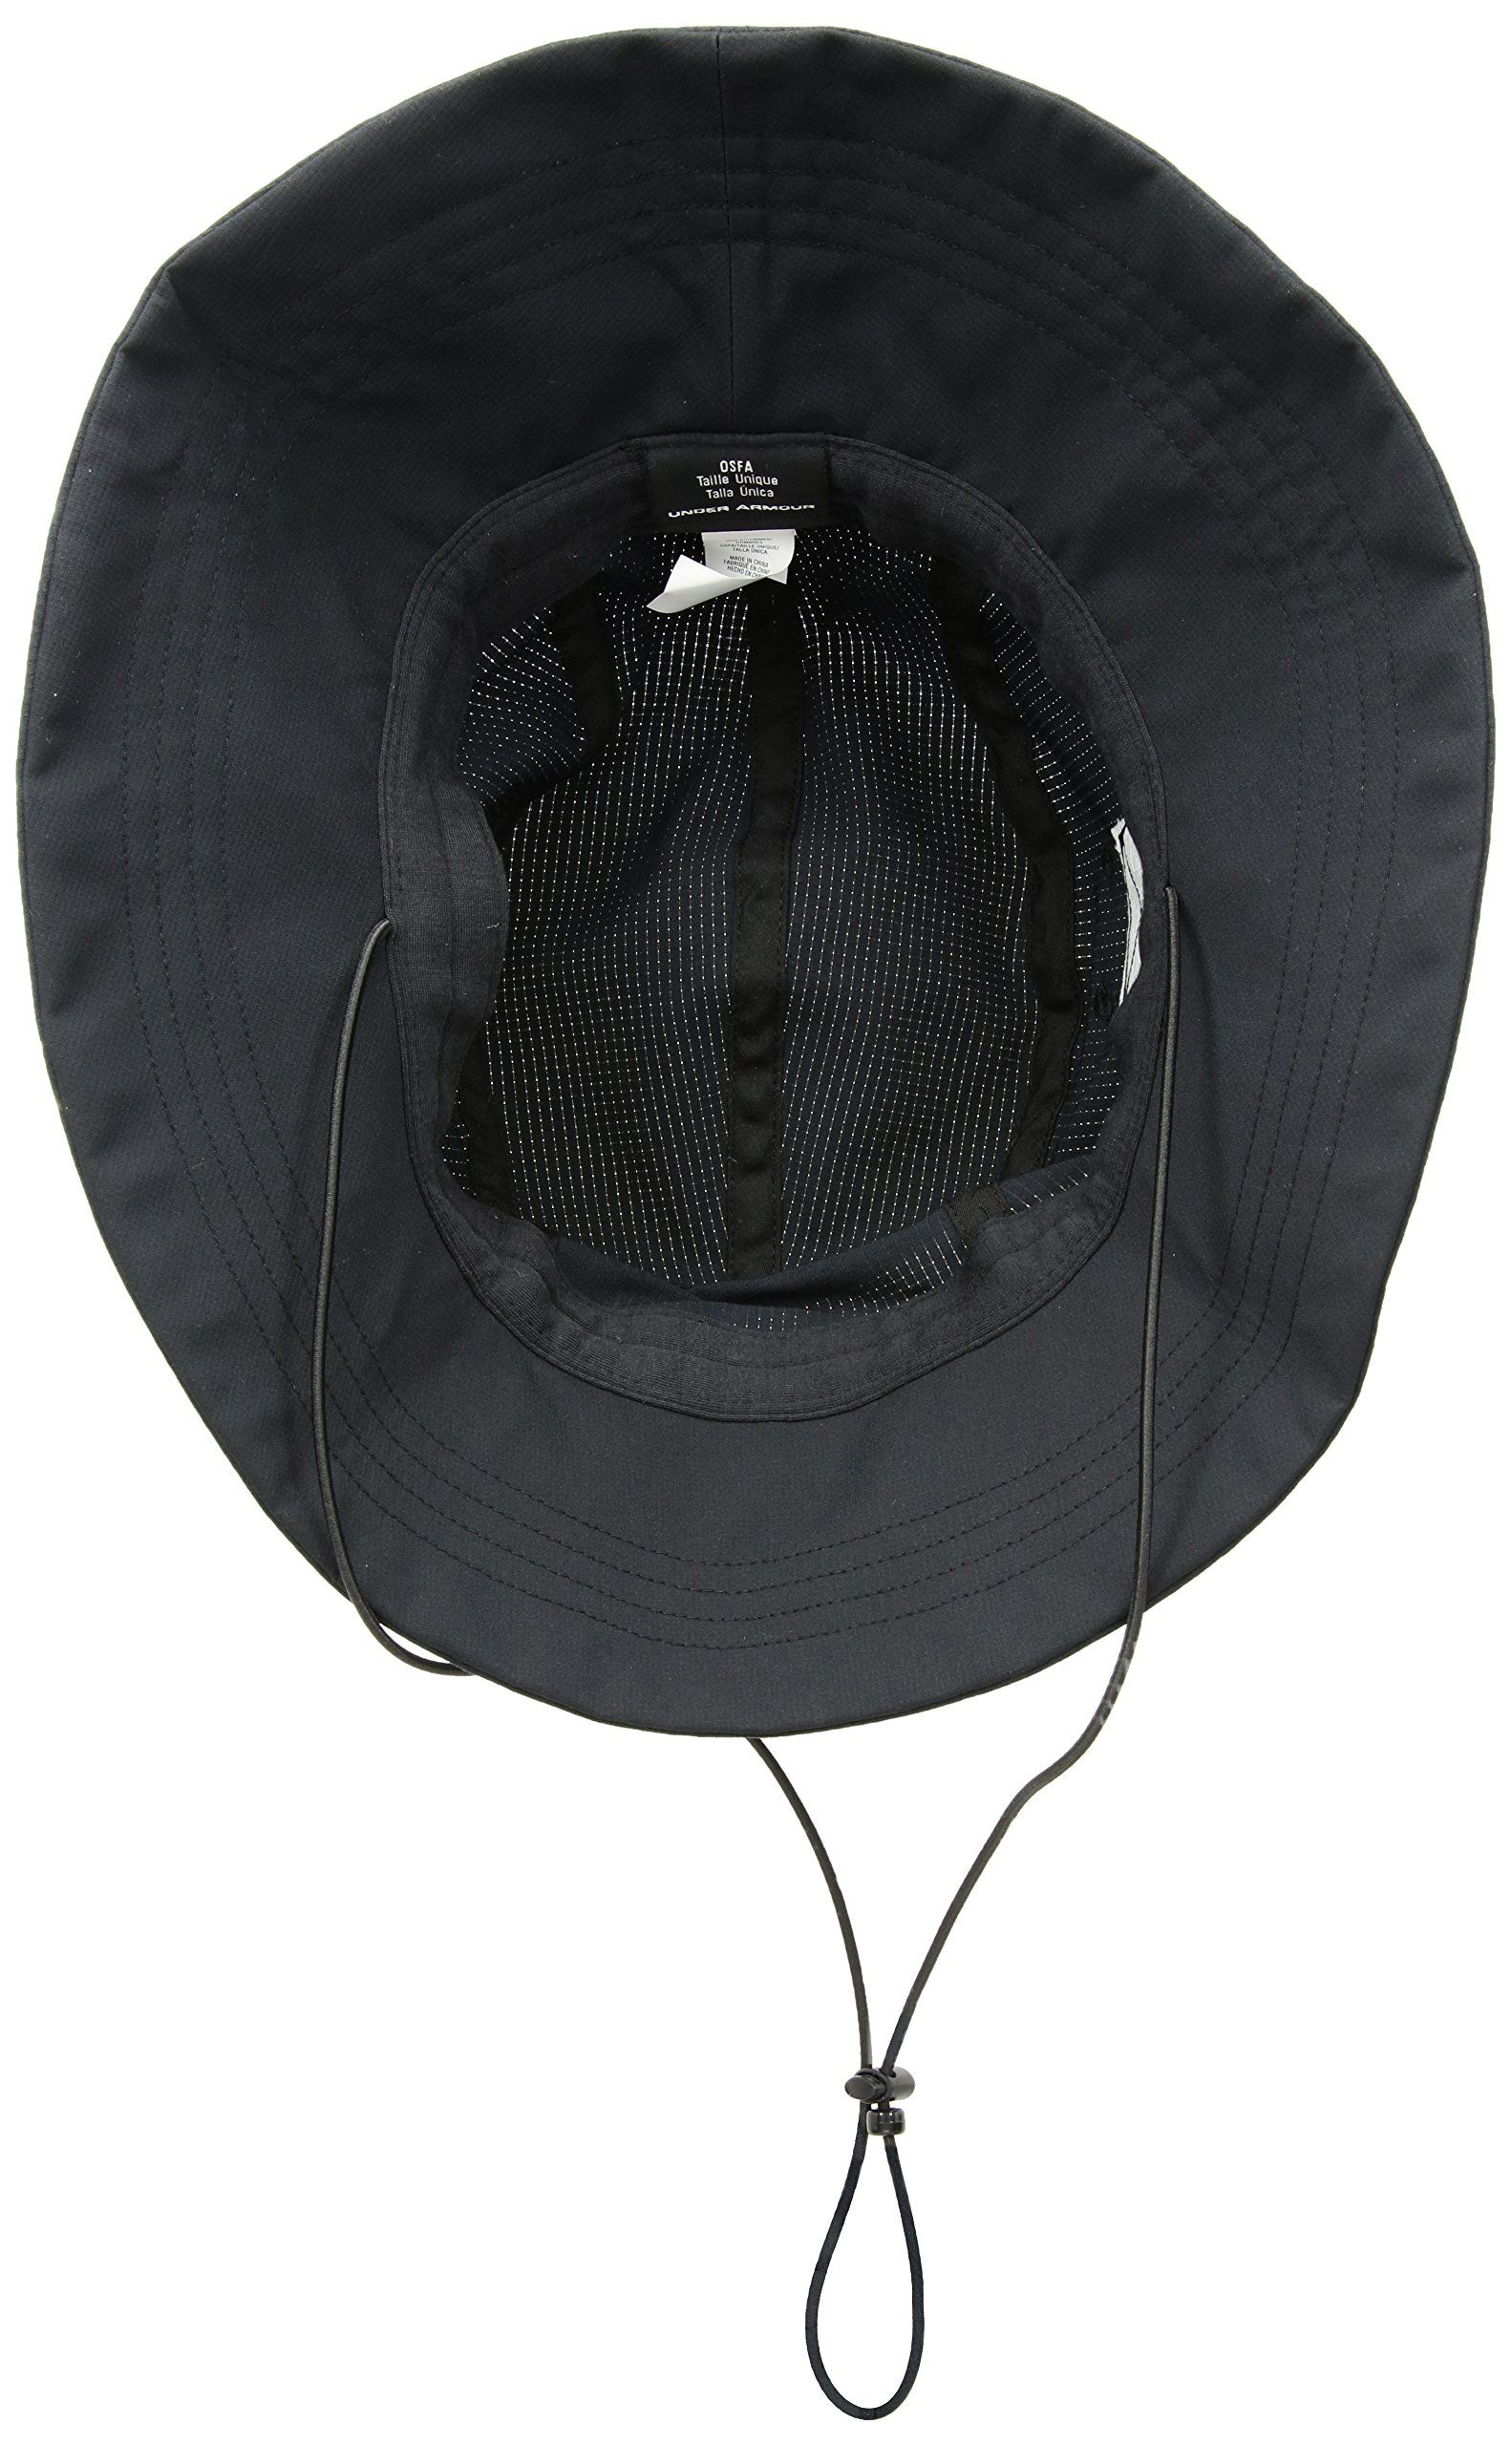 8a4de832ae6 Men Golf Clothing - Under Armour Mens ArmourVent Warrior Bucket 2.0 Hat  Black 001 Graphite One Size